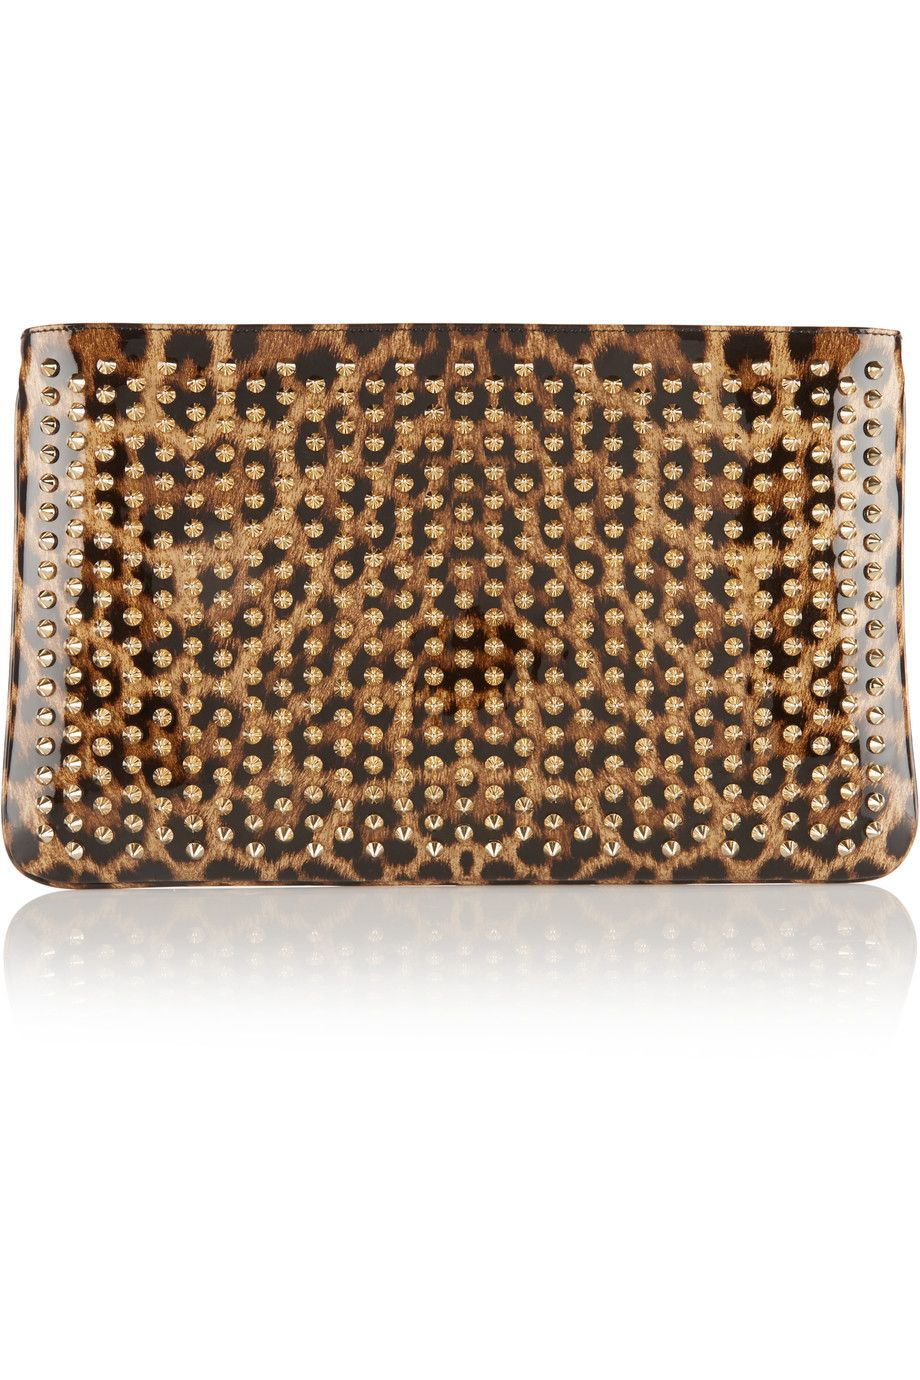 c447e225dea Christian Louboutin - Loubiposh spiked leopard-print patent-leather ...